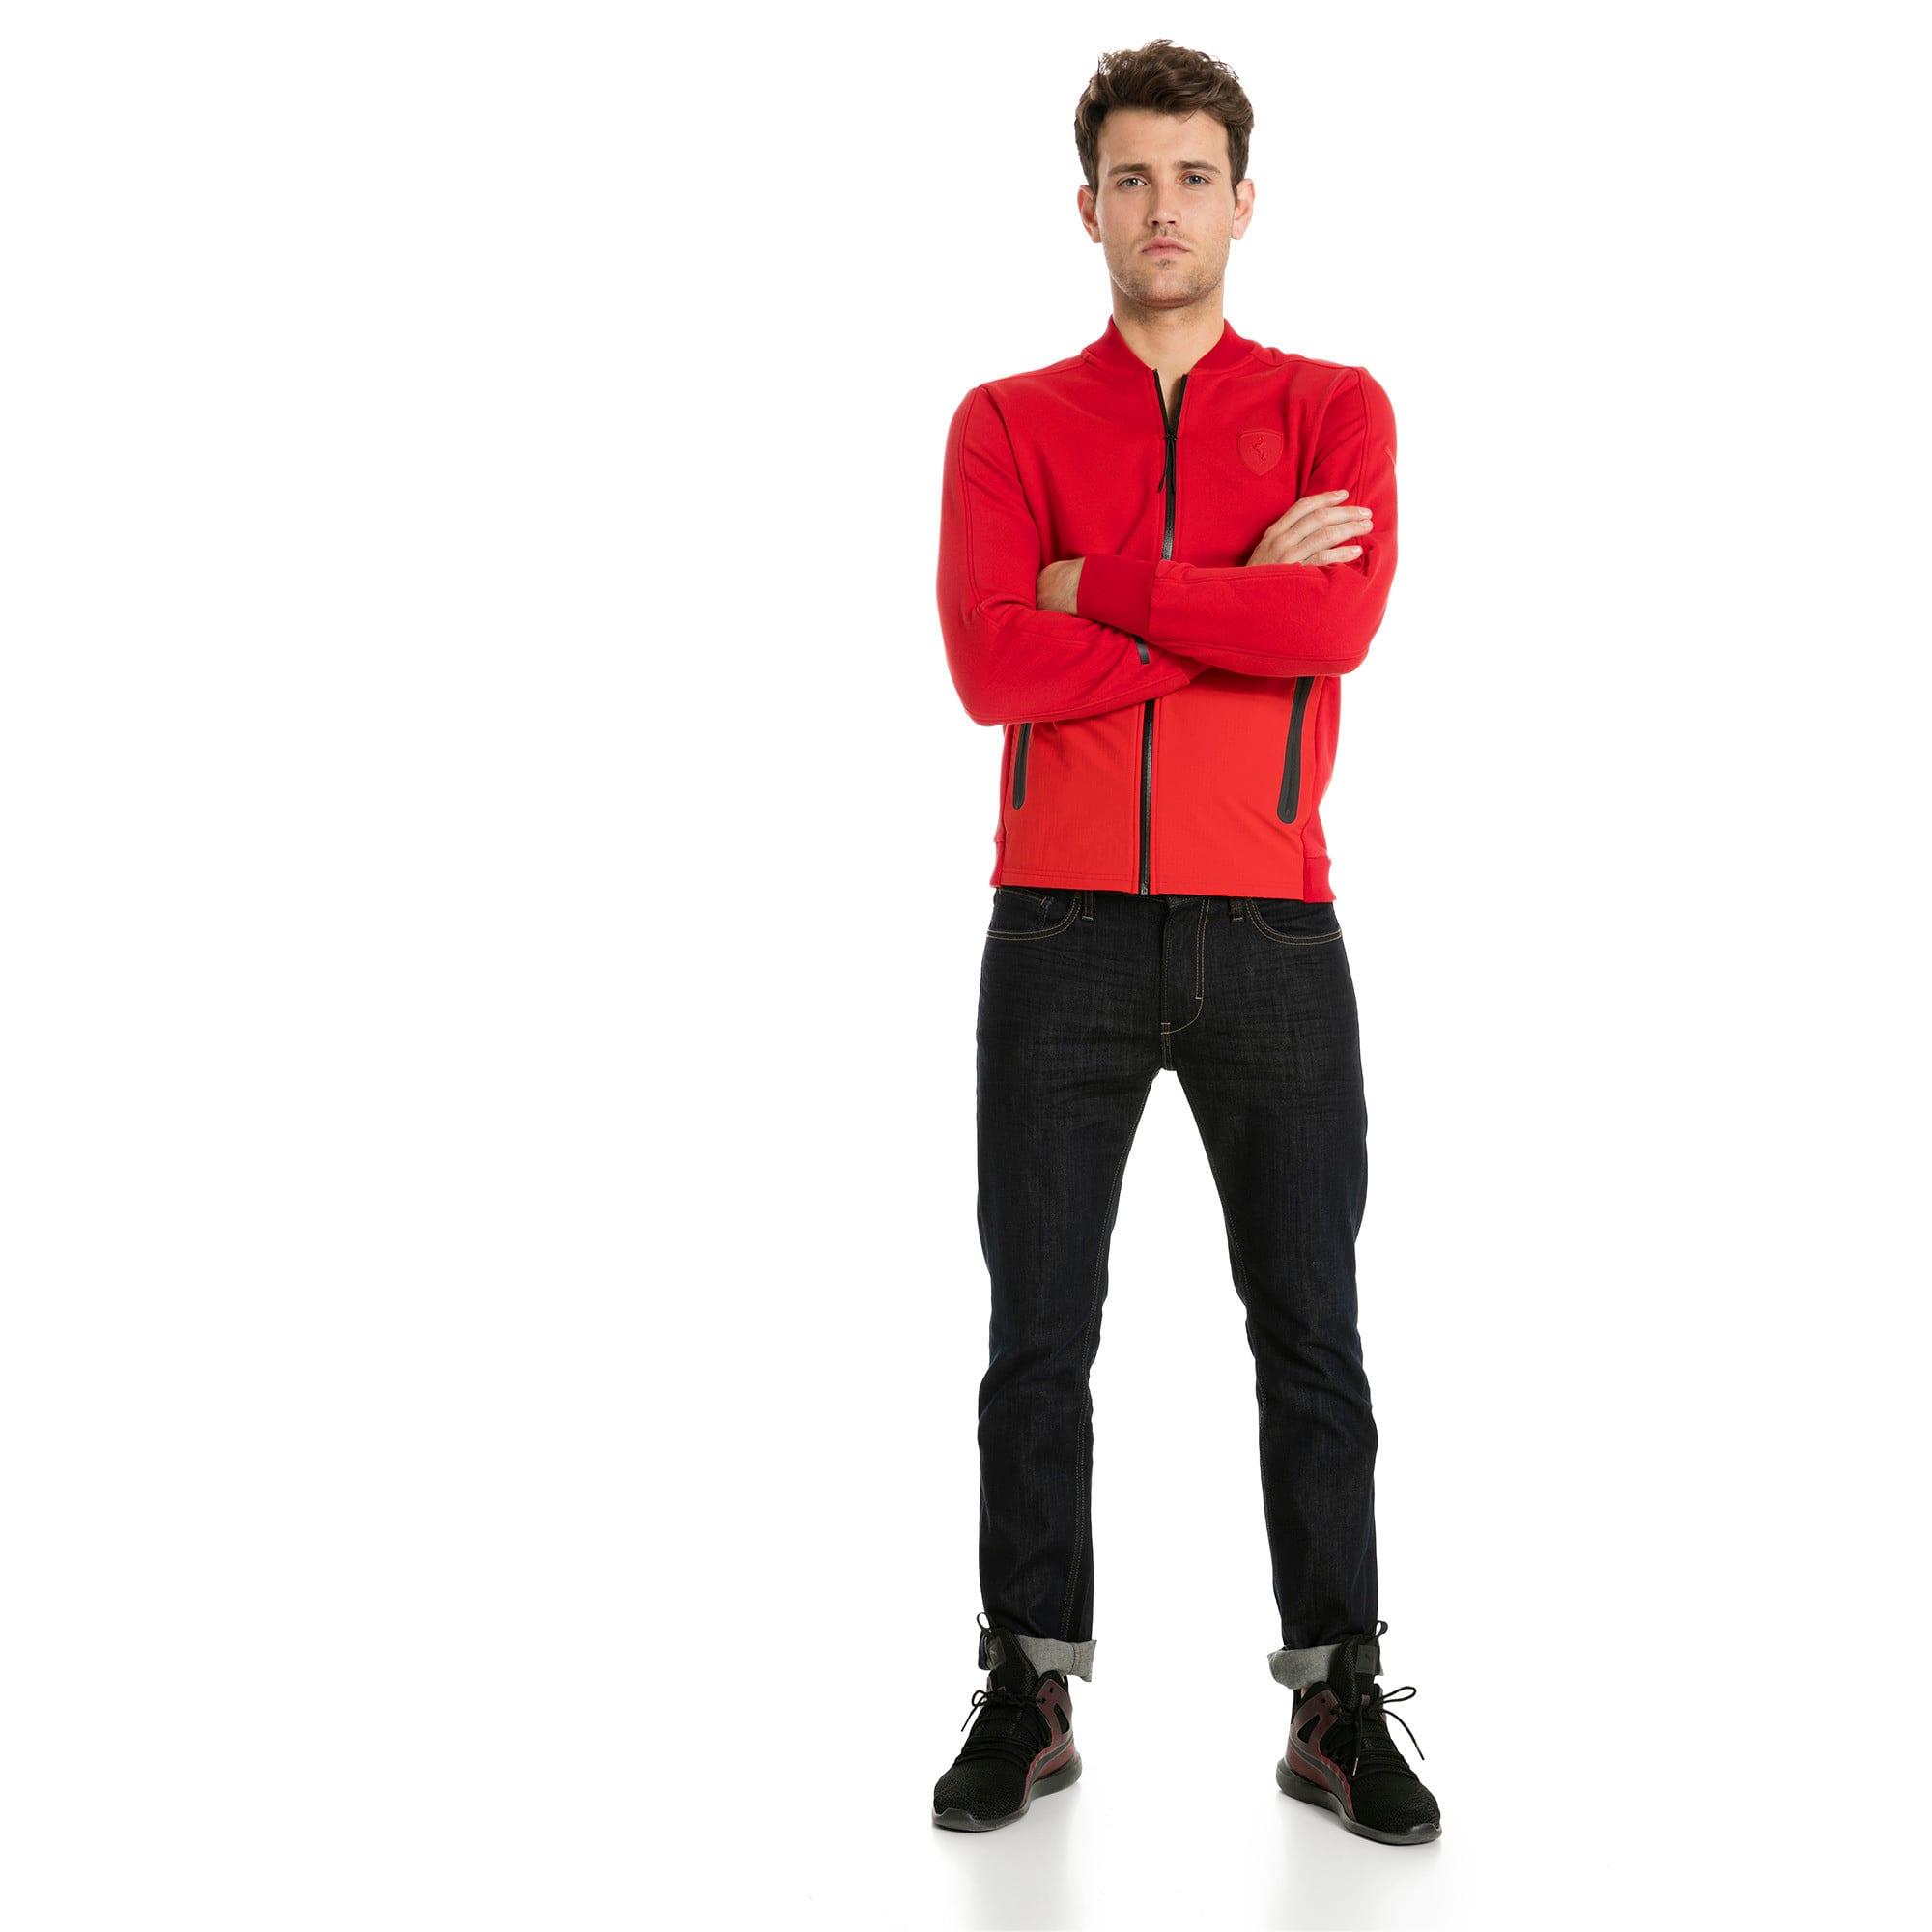 Thumbnail 3 of Ferrari Lifestyle Men's Sweat Jacket, Rosso Corsa, medium-IND